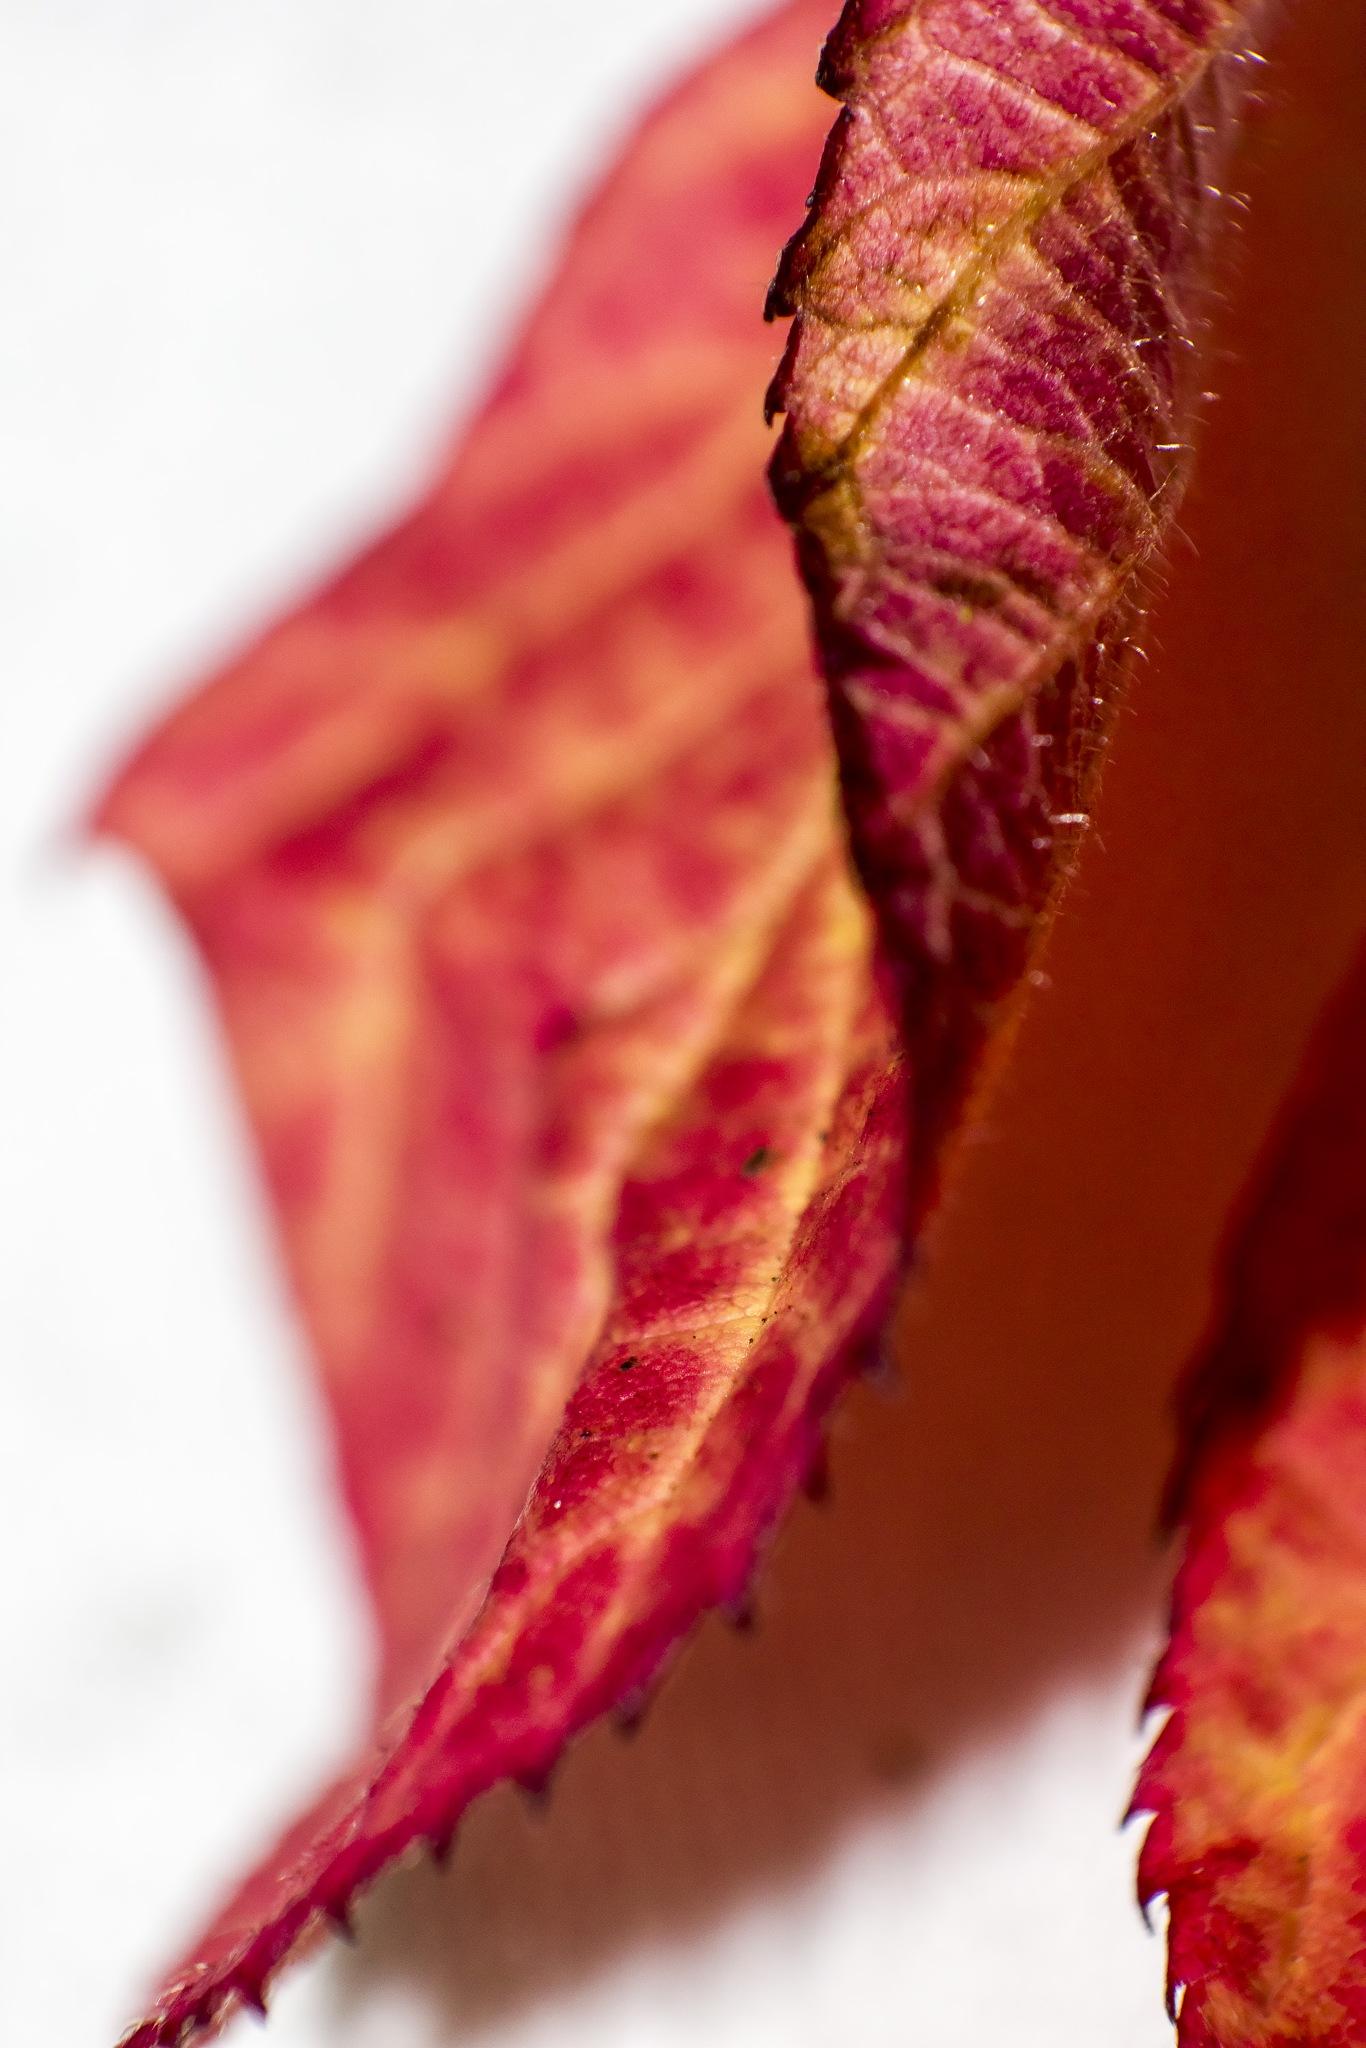 Red. Dead. Or nearly dead  by Domas Rakauskas